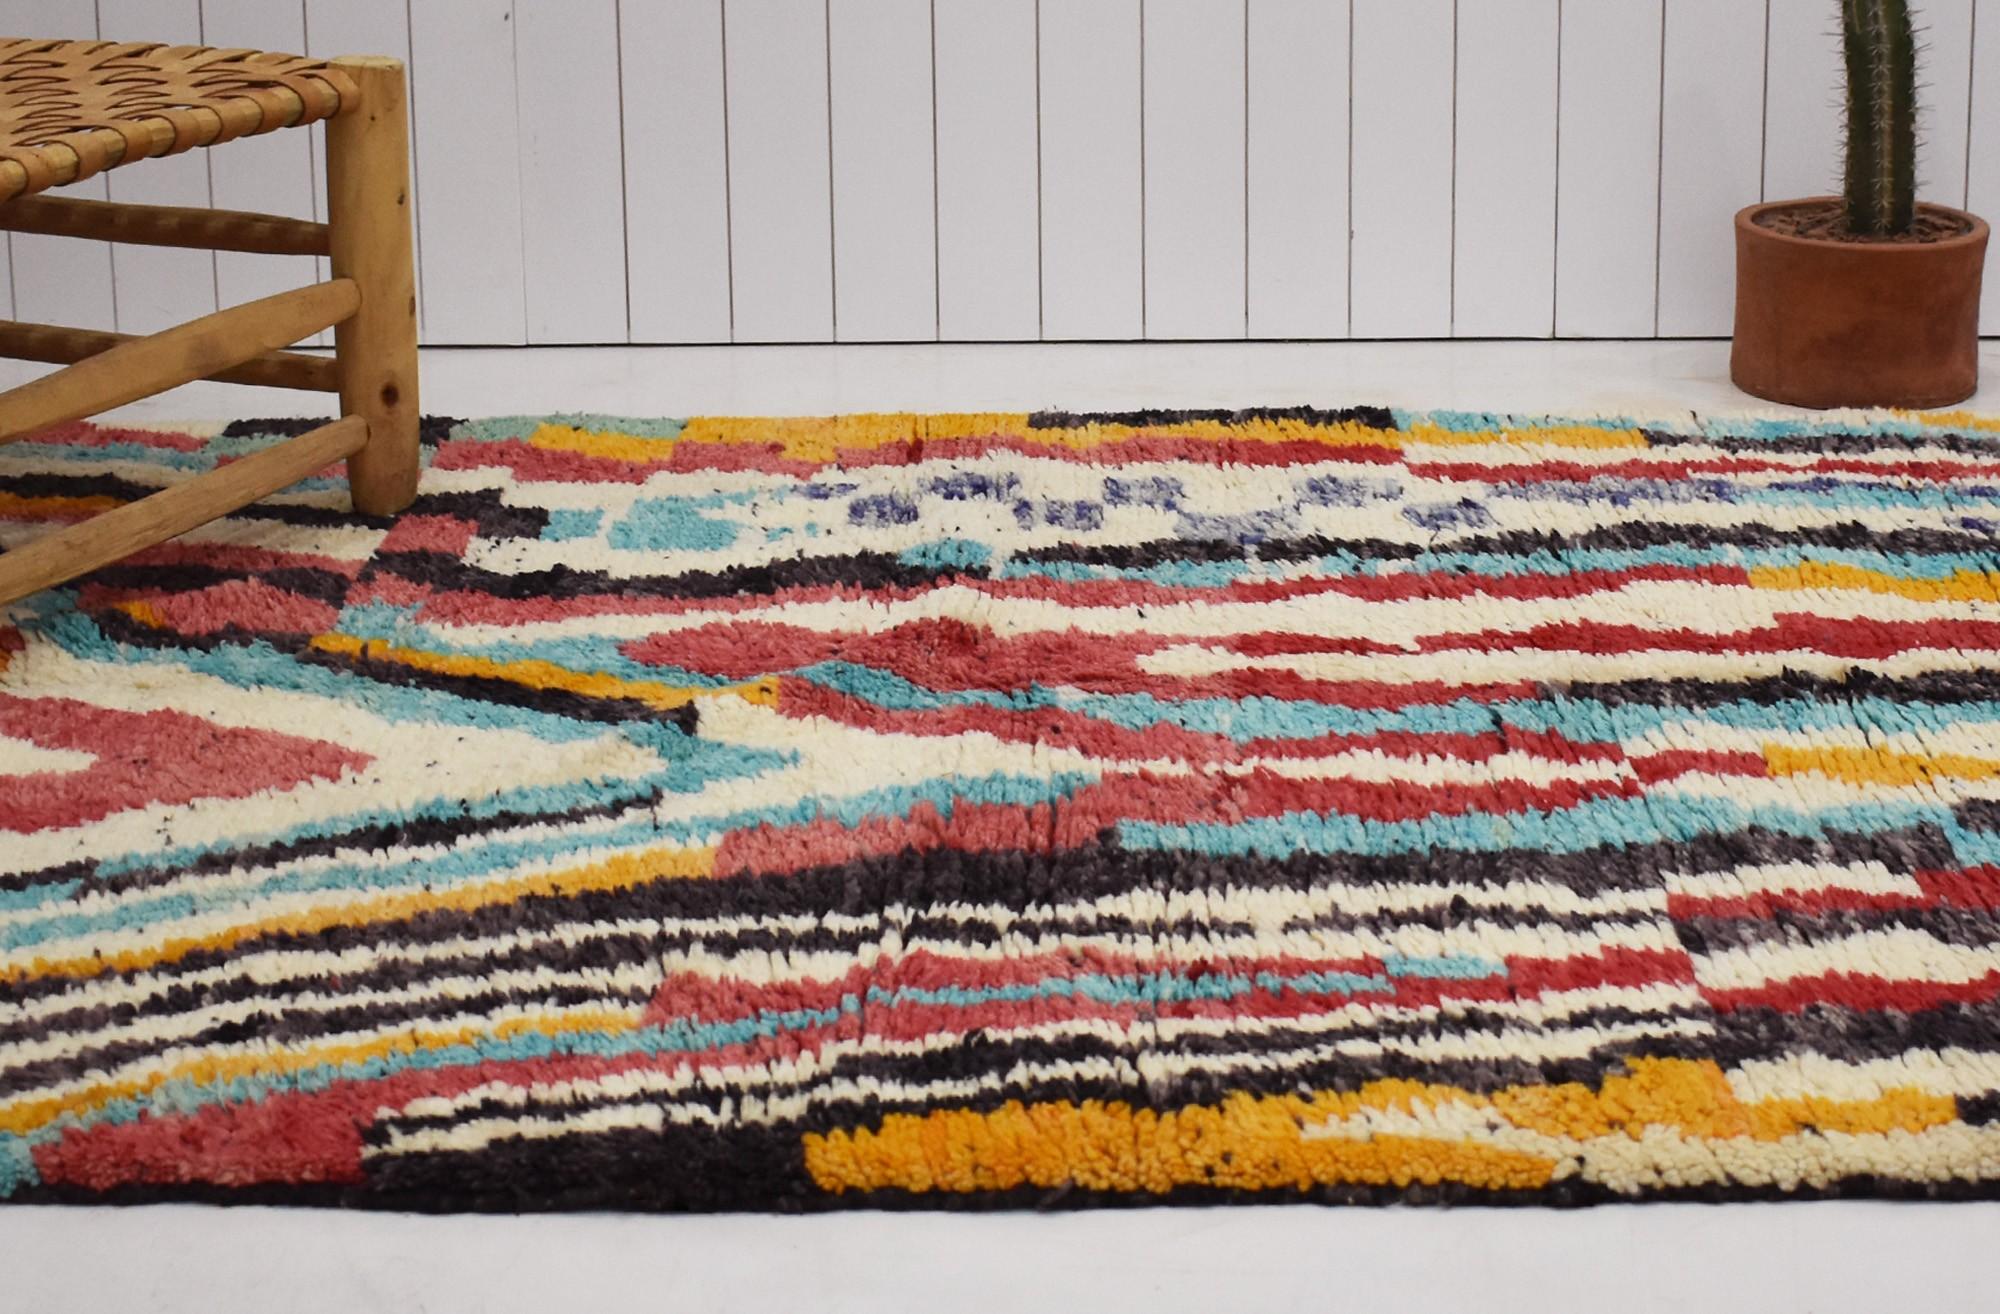 Multicolored Berber carpet with black fringes